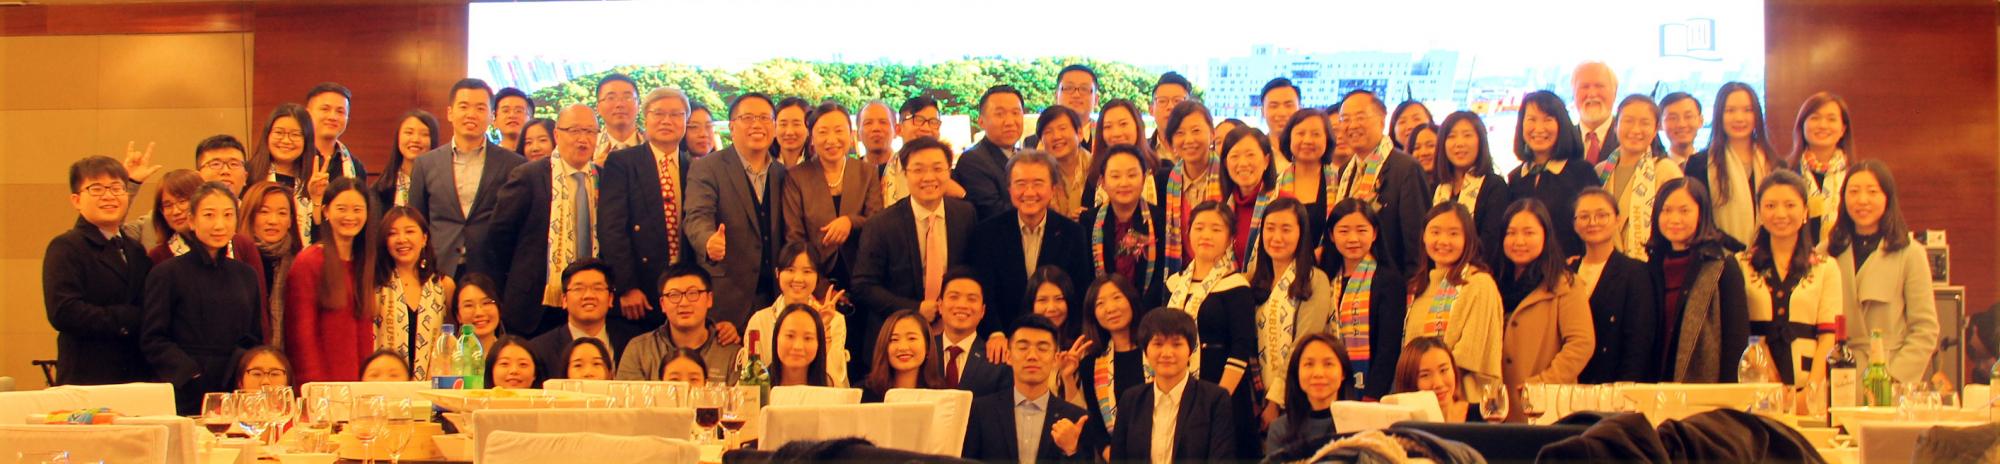 BU Family @Shanghai 香港浸会大学上海校友会成立!